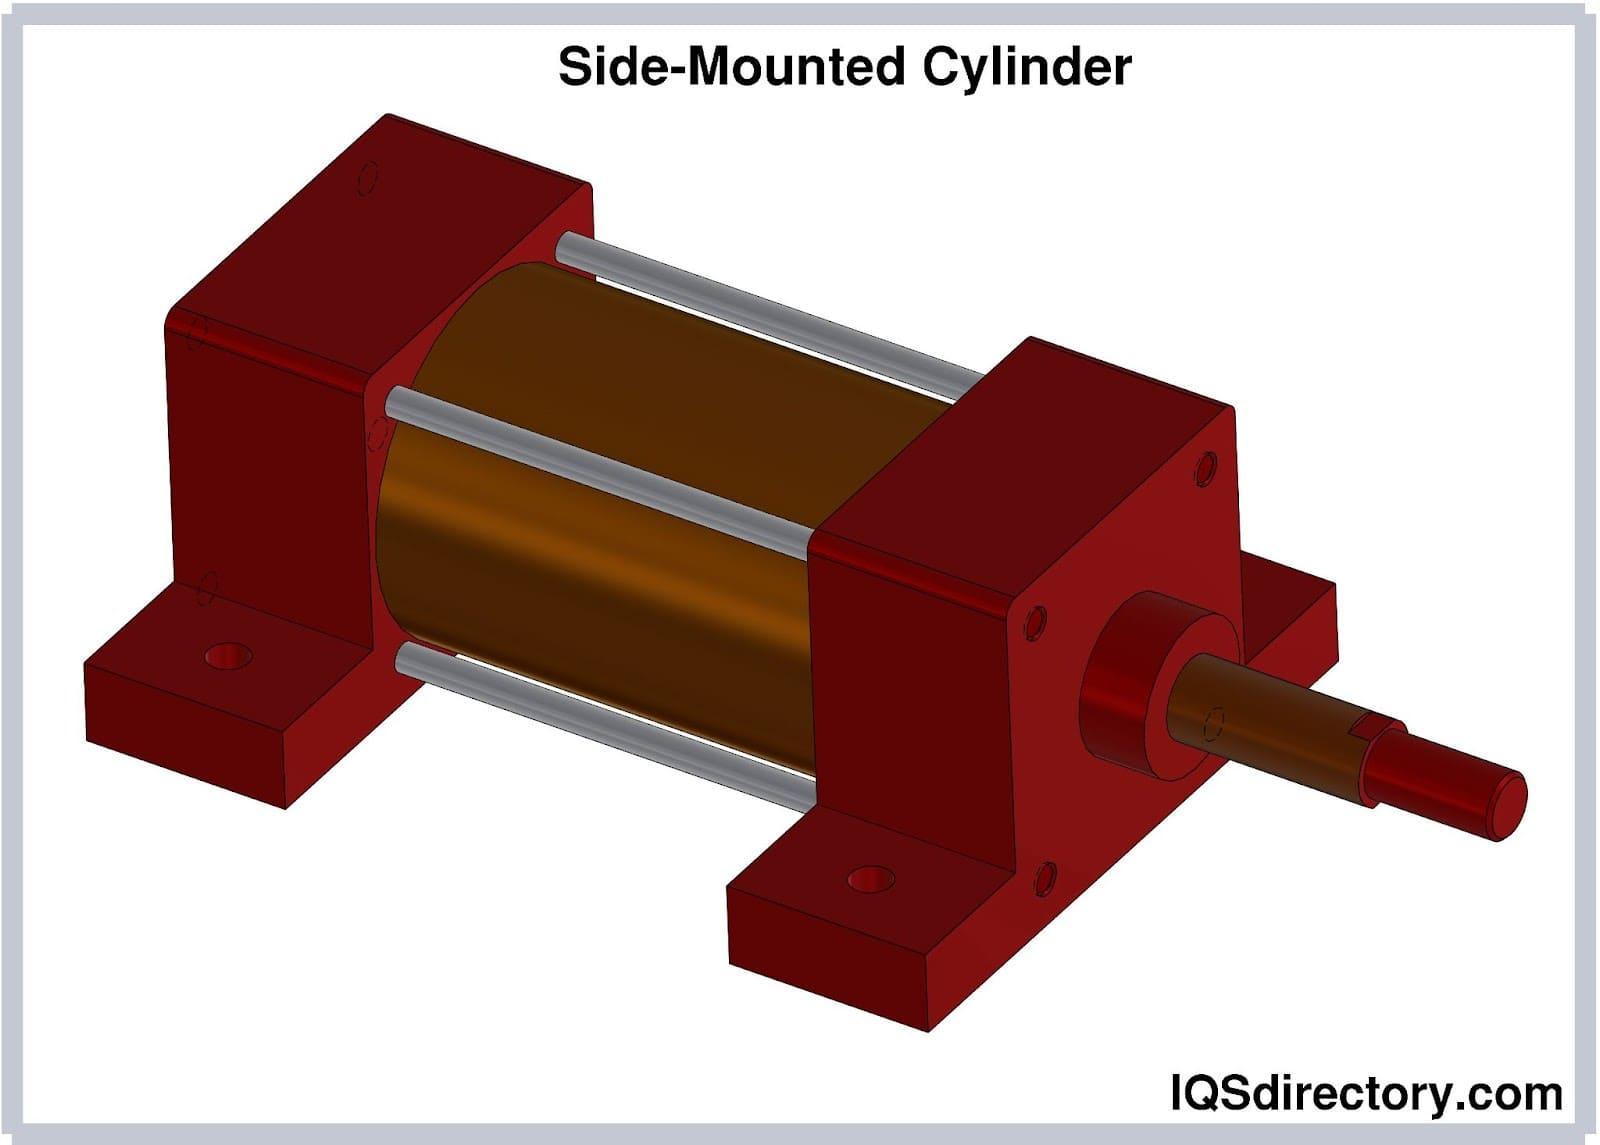 Side-Mounted Cylinder